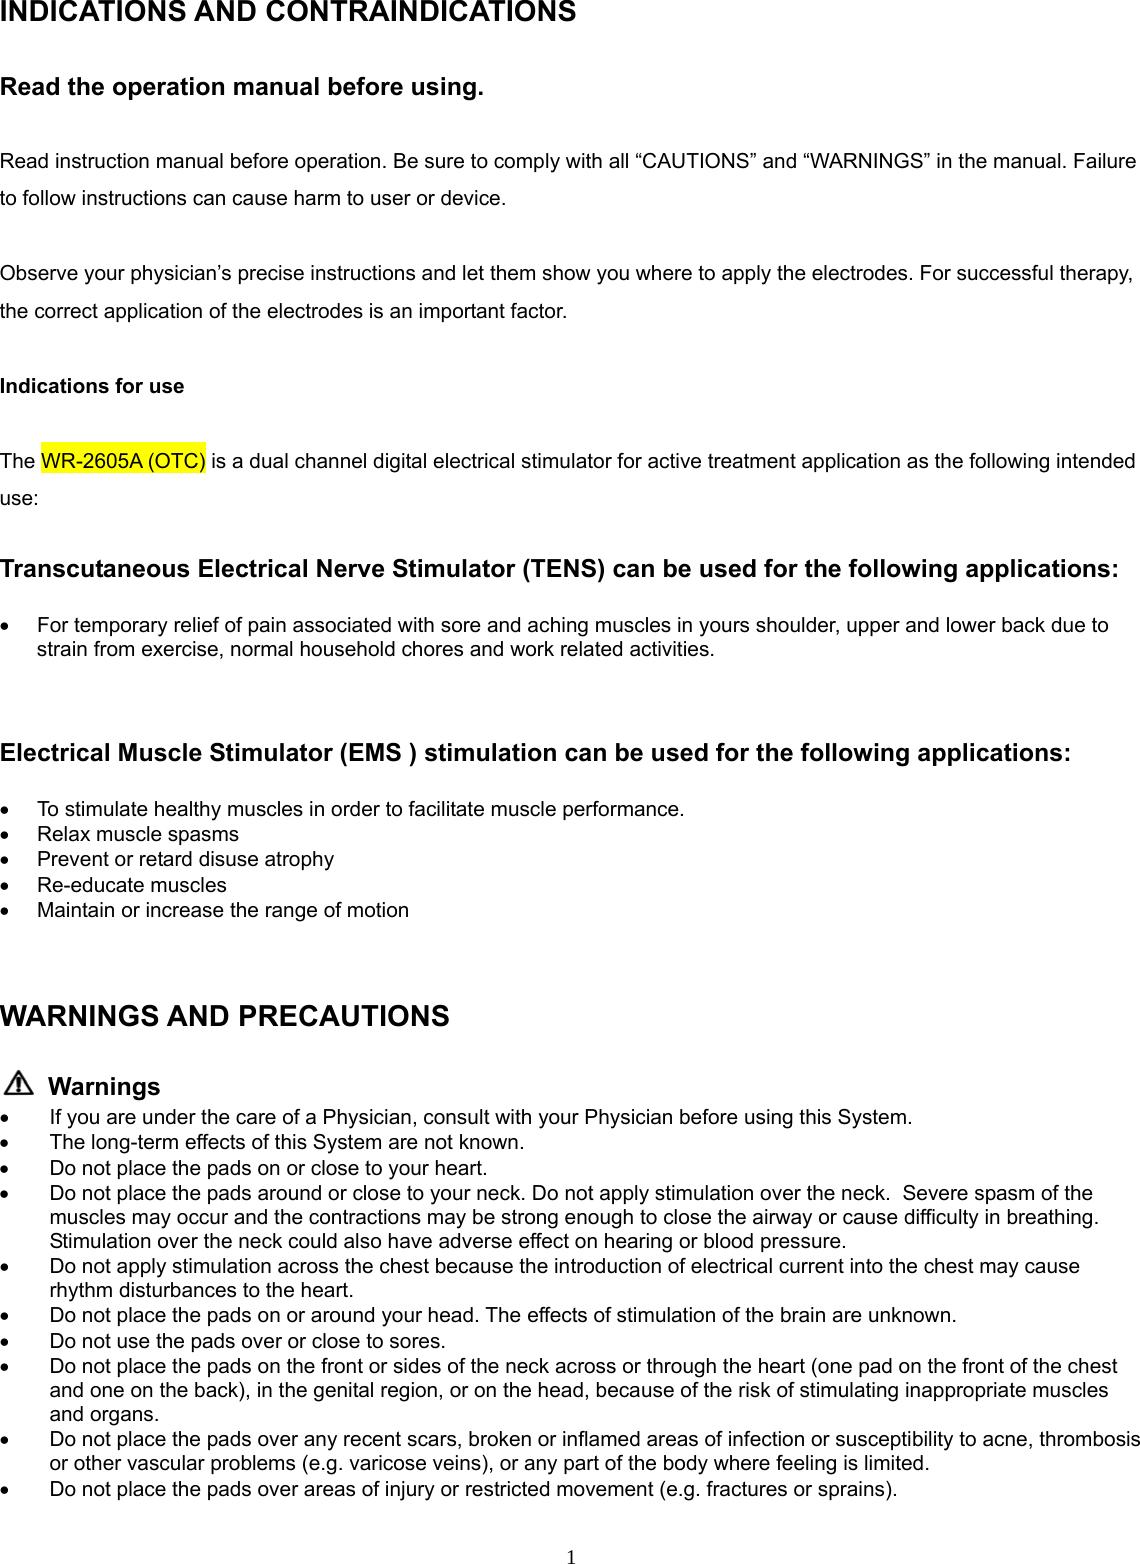 Electrical Xft Electrical Stimulator Manual Guide